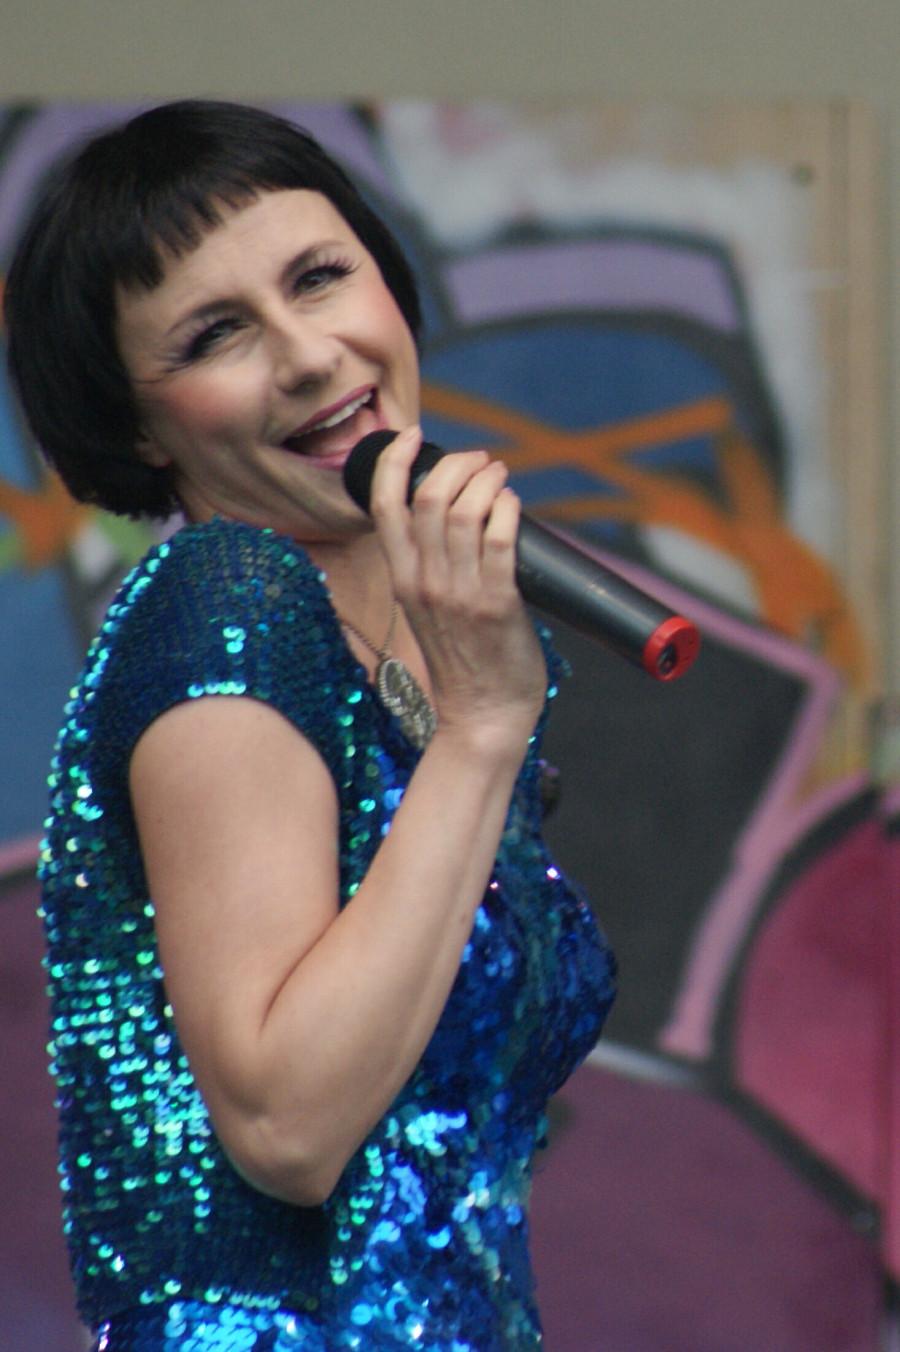 Barbara Melzer